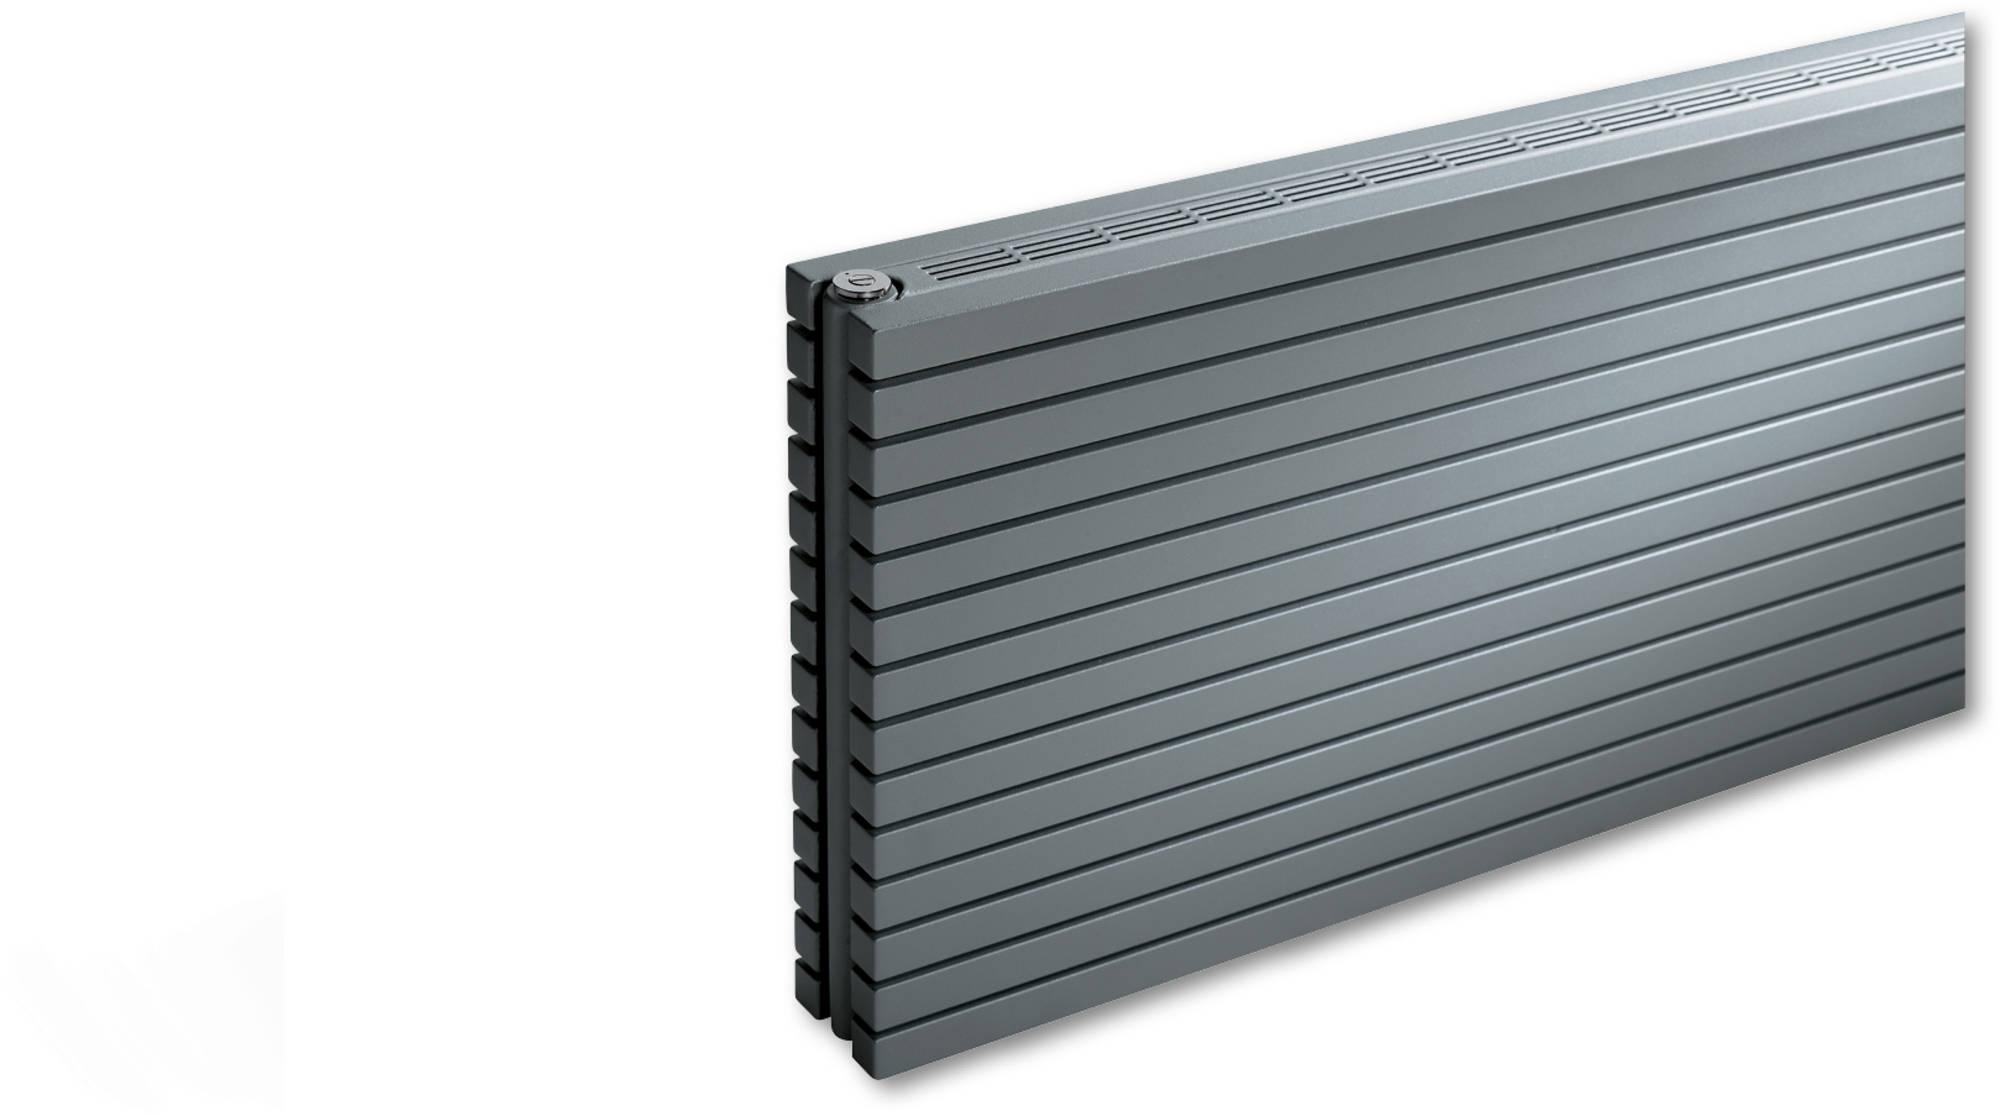 Paneelradiator